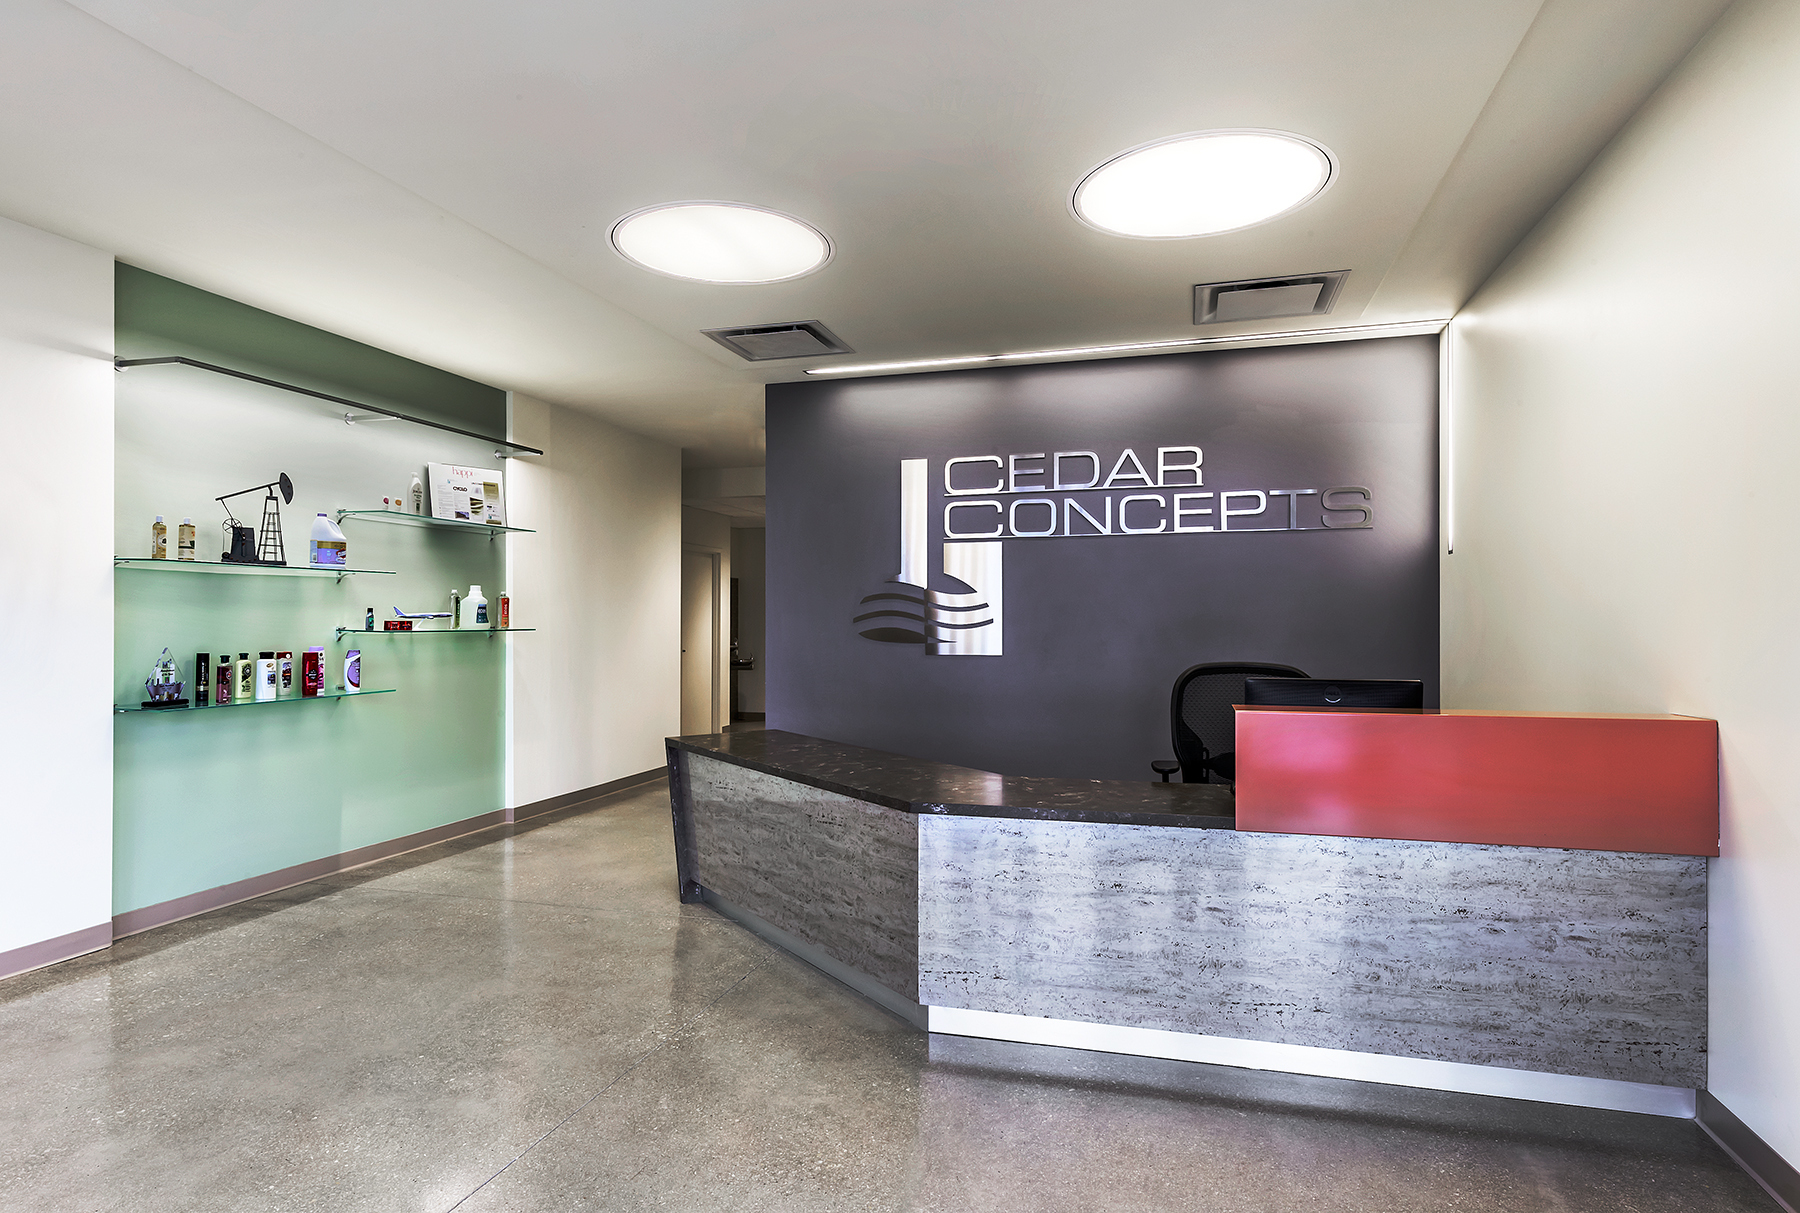 Cedar-Concepts-Chicago-Illinois-Receptio